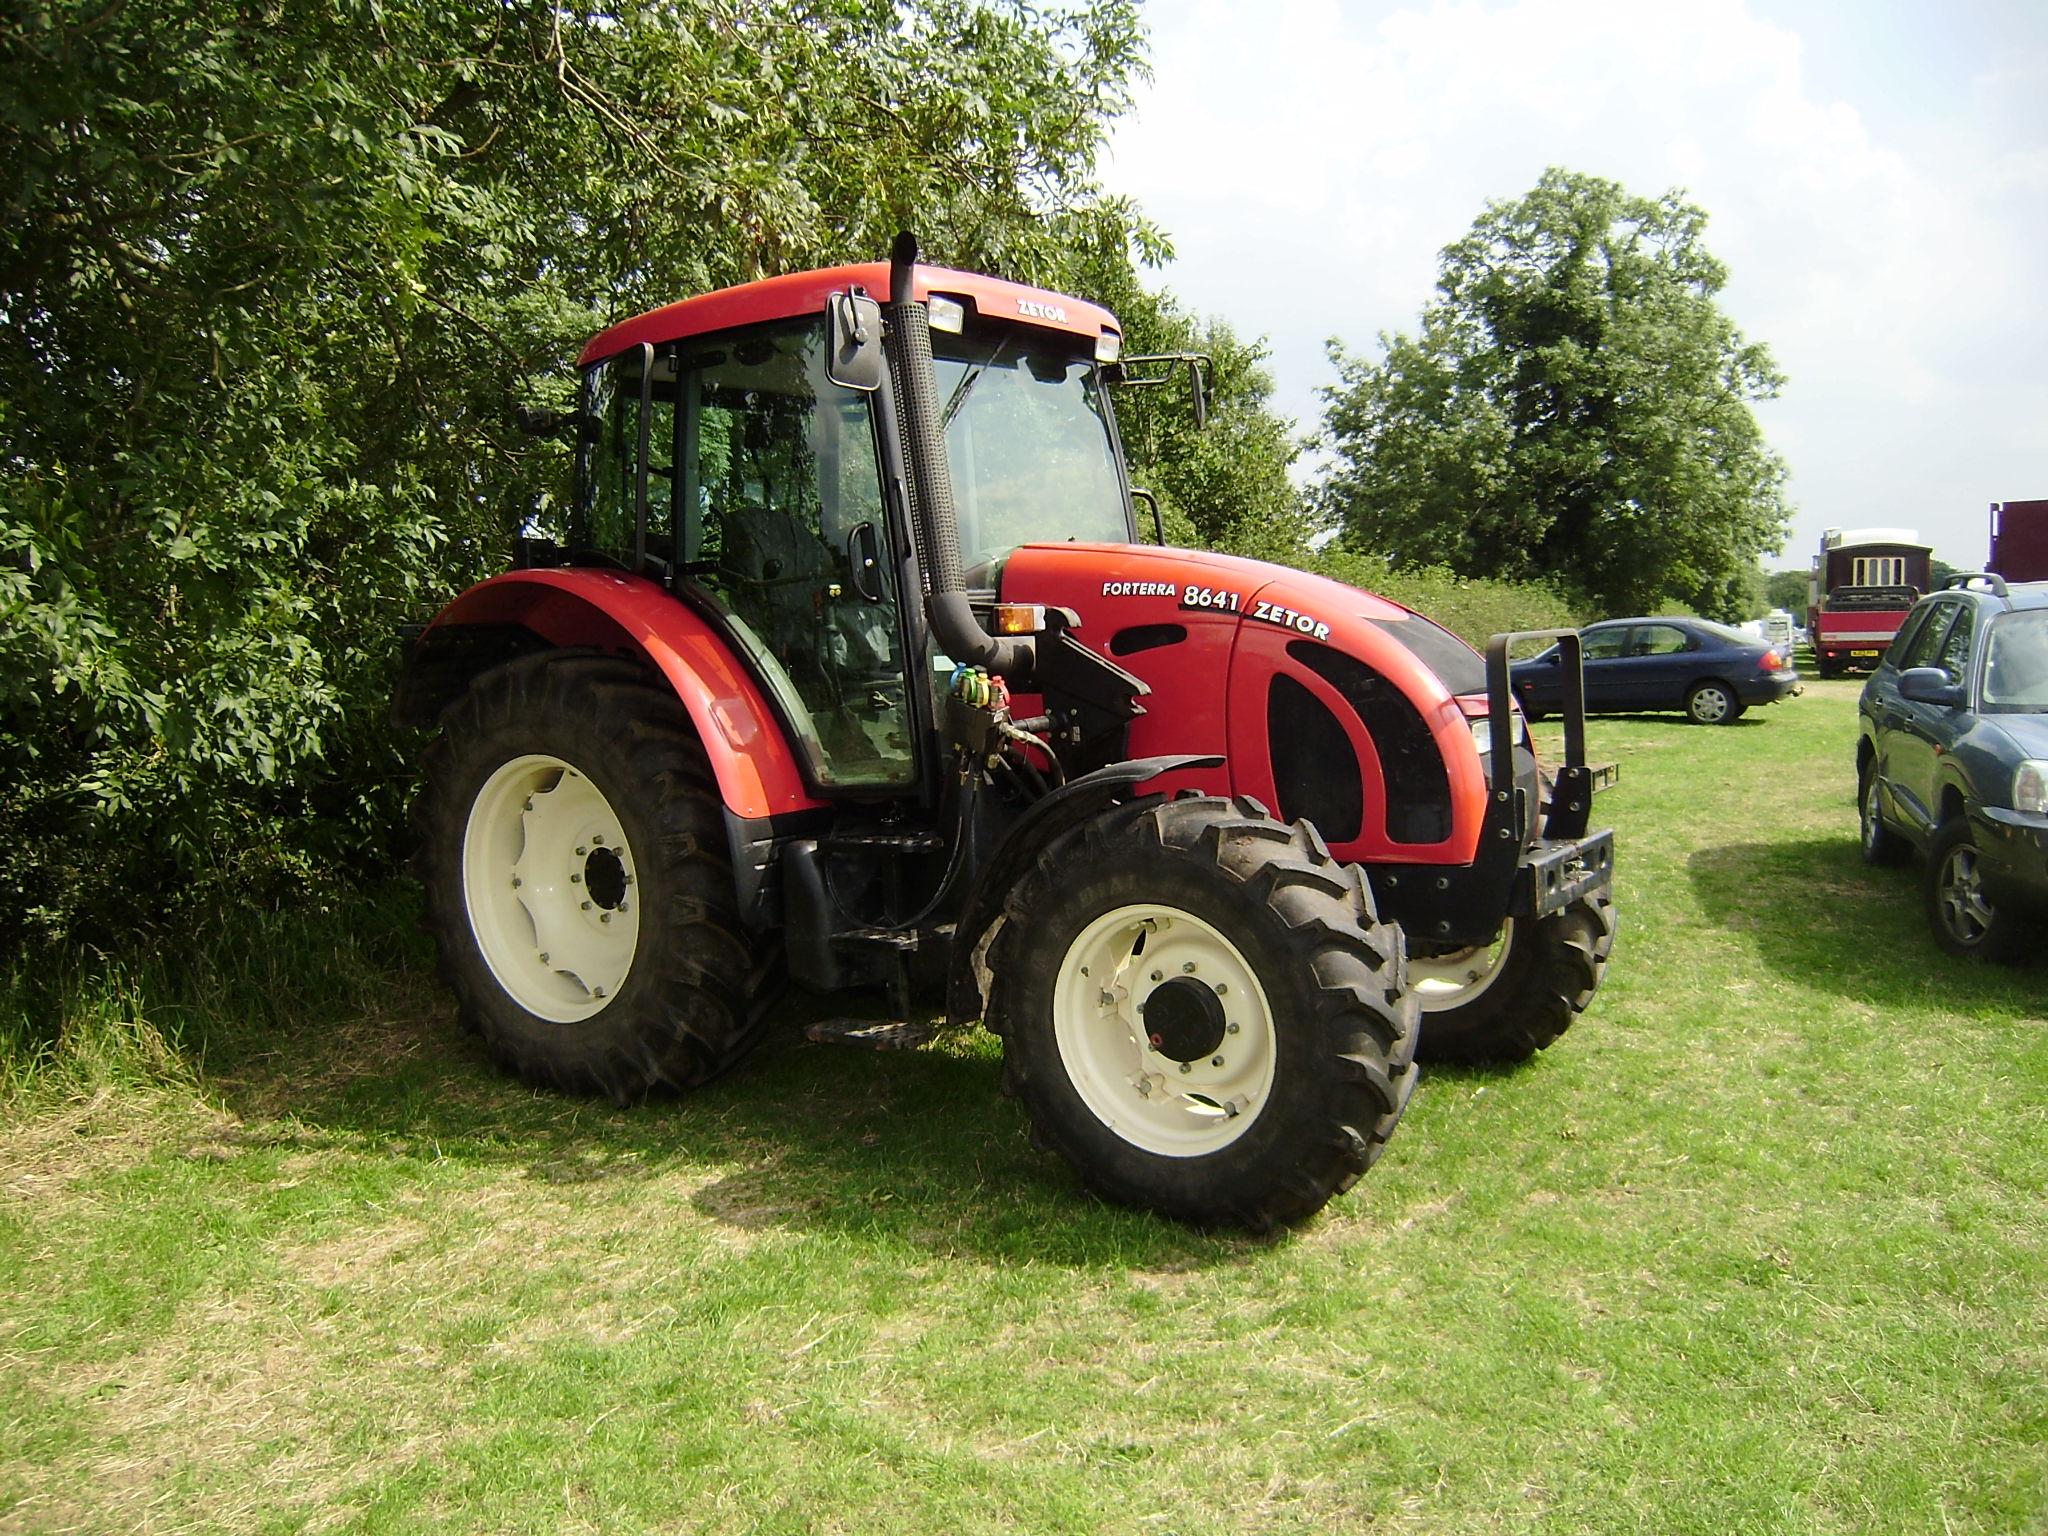 Zetor 8641 a modern 4-wd tractor